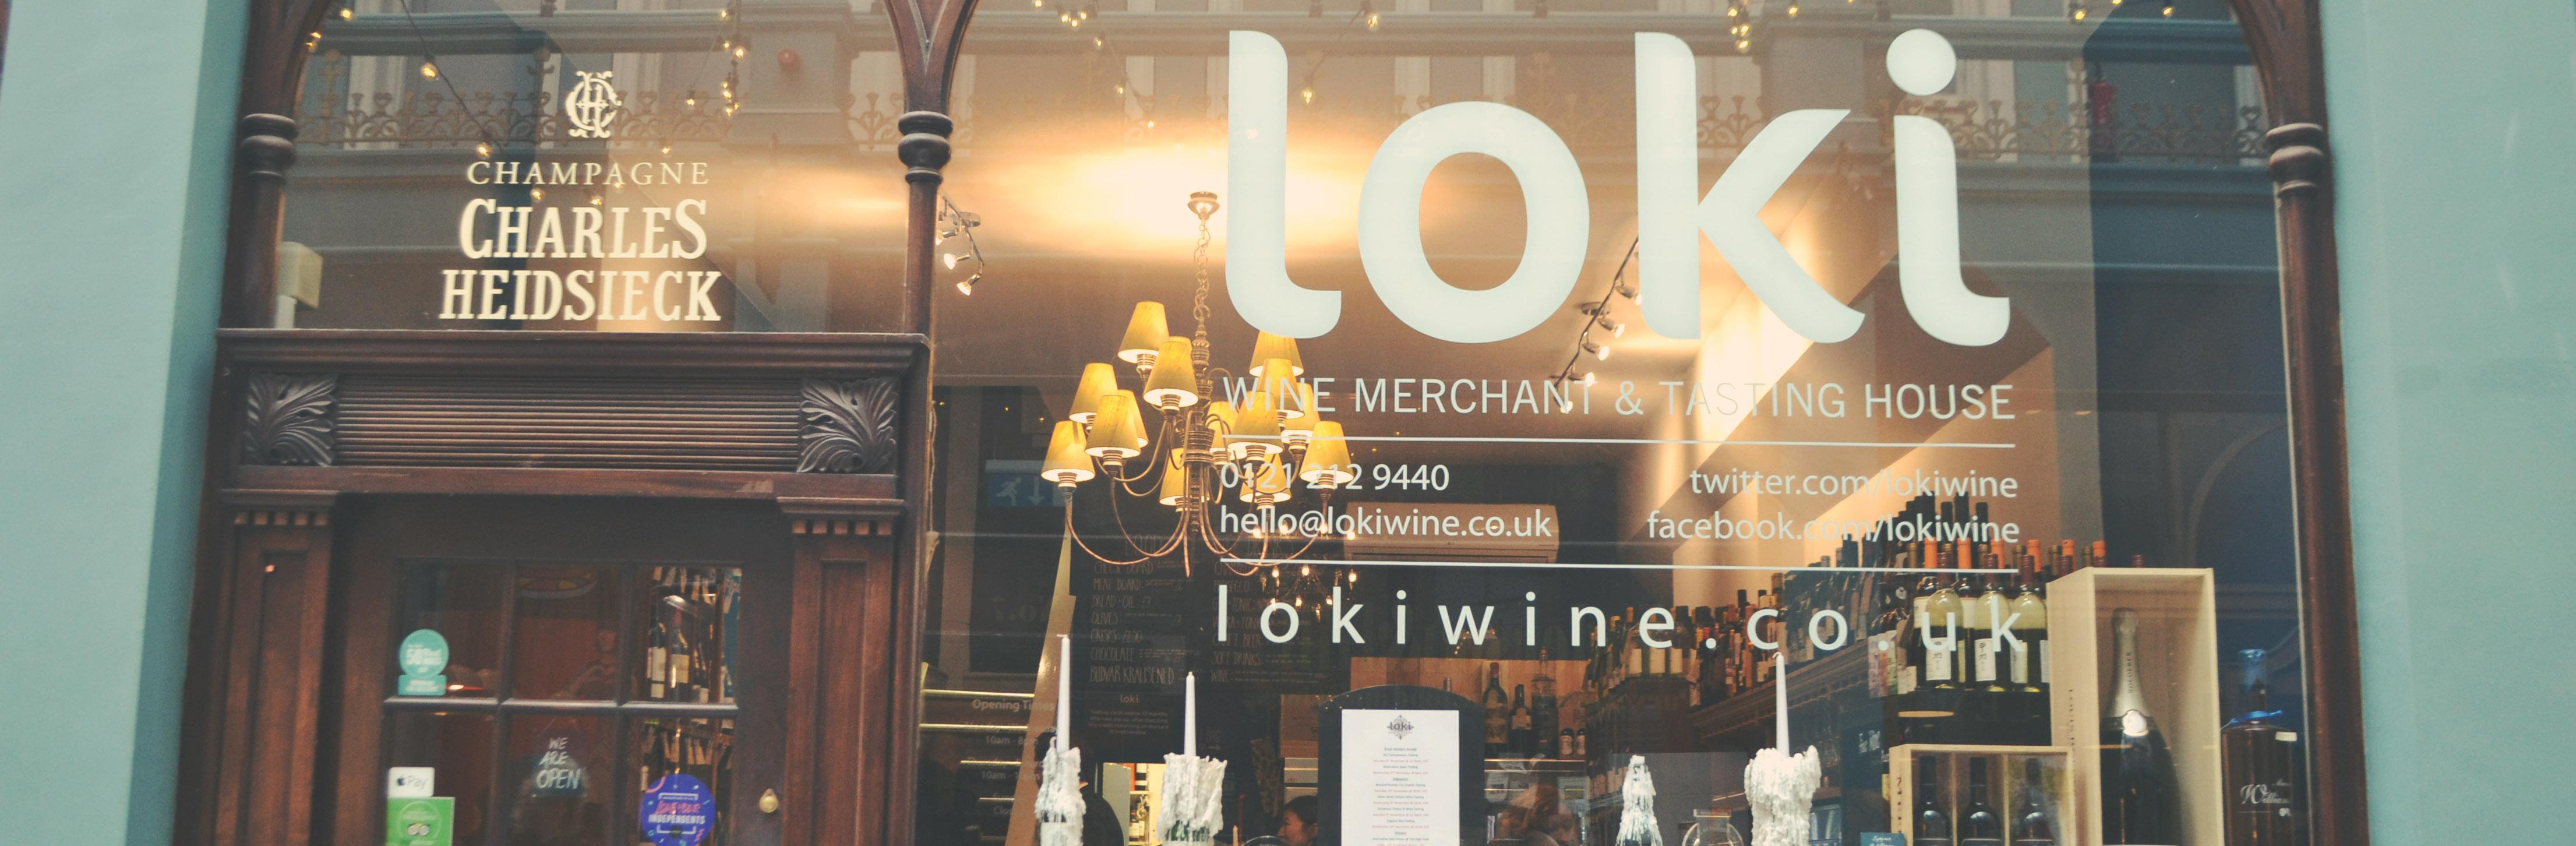 Loki Wine Birmingham